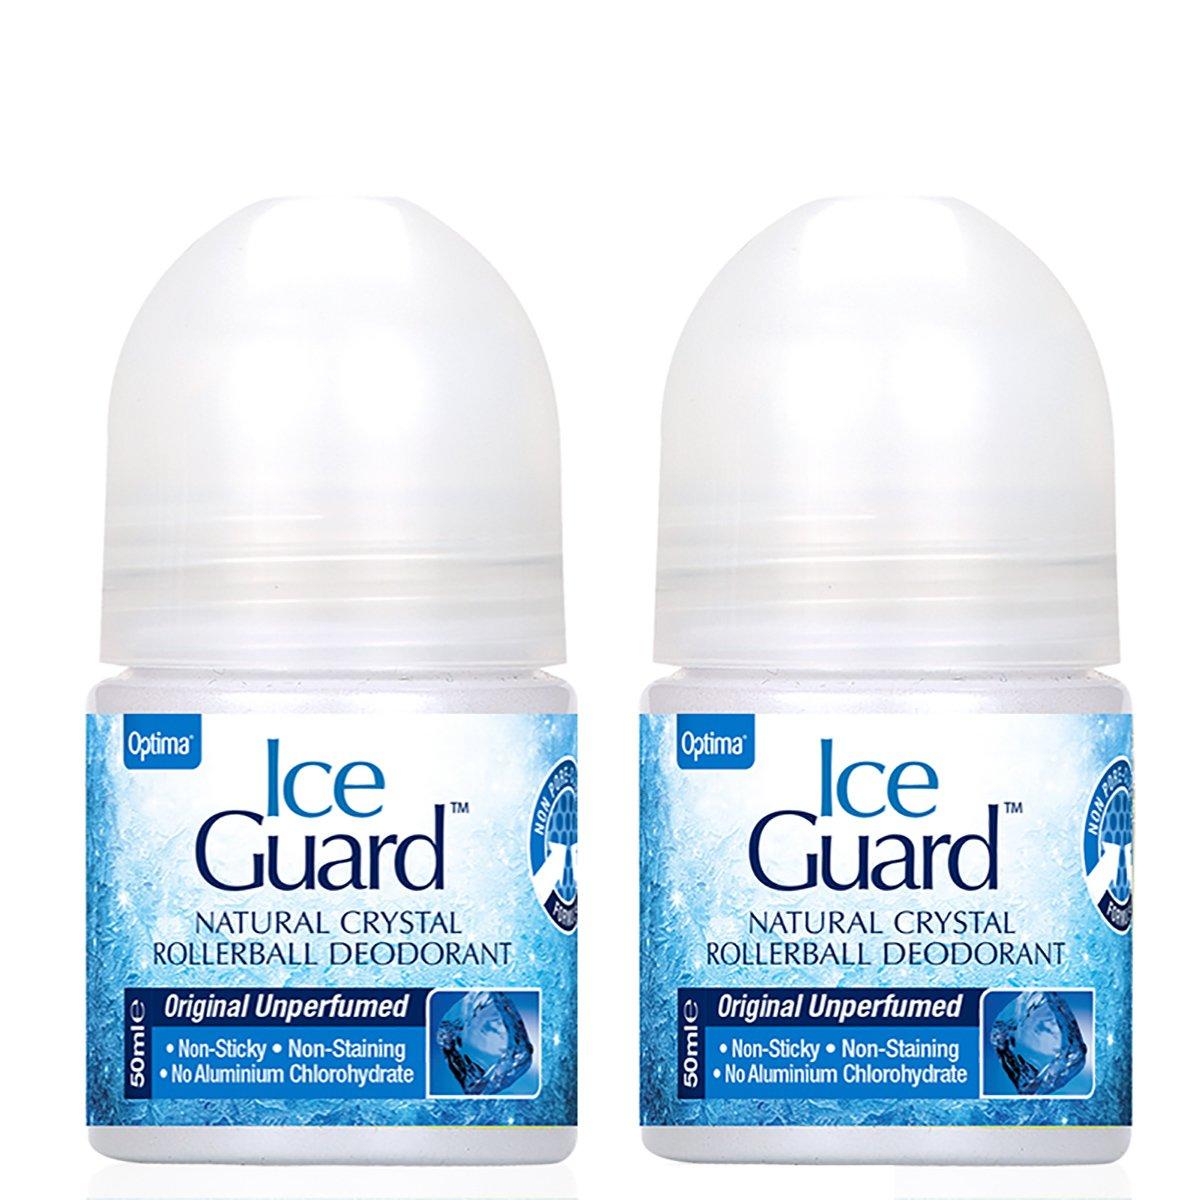 Optima Πακέτο Προσφοράς Ice Guard Rollerball Deodorant Αποσμητικό Από Φυσικά Μεταλλικά Άλατα 2x50ml, -50% στο 2ο Προϊόν